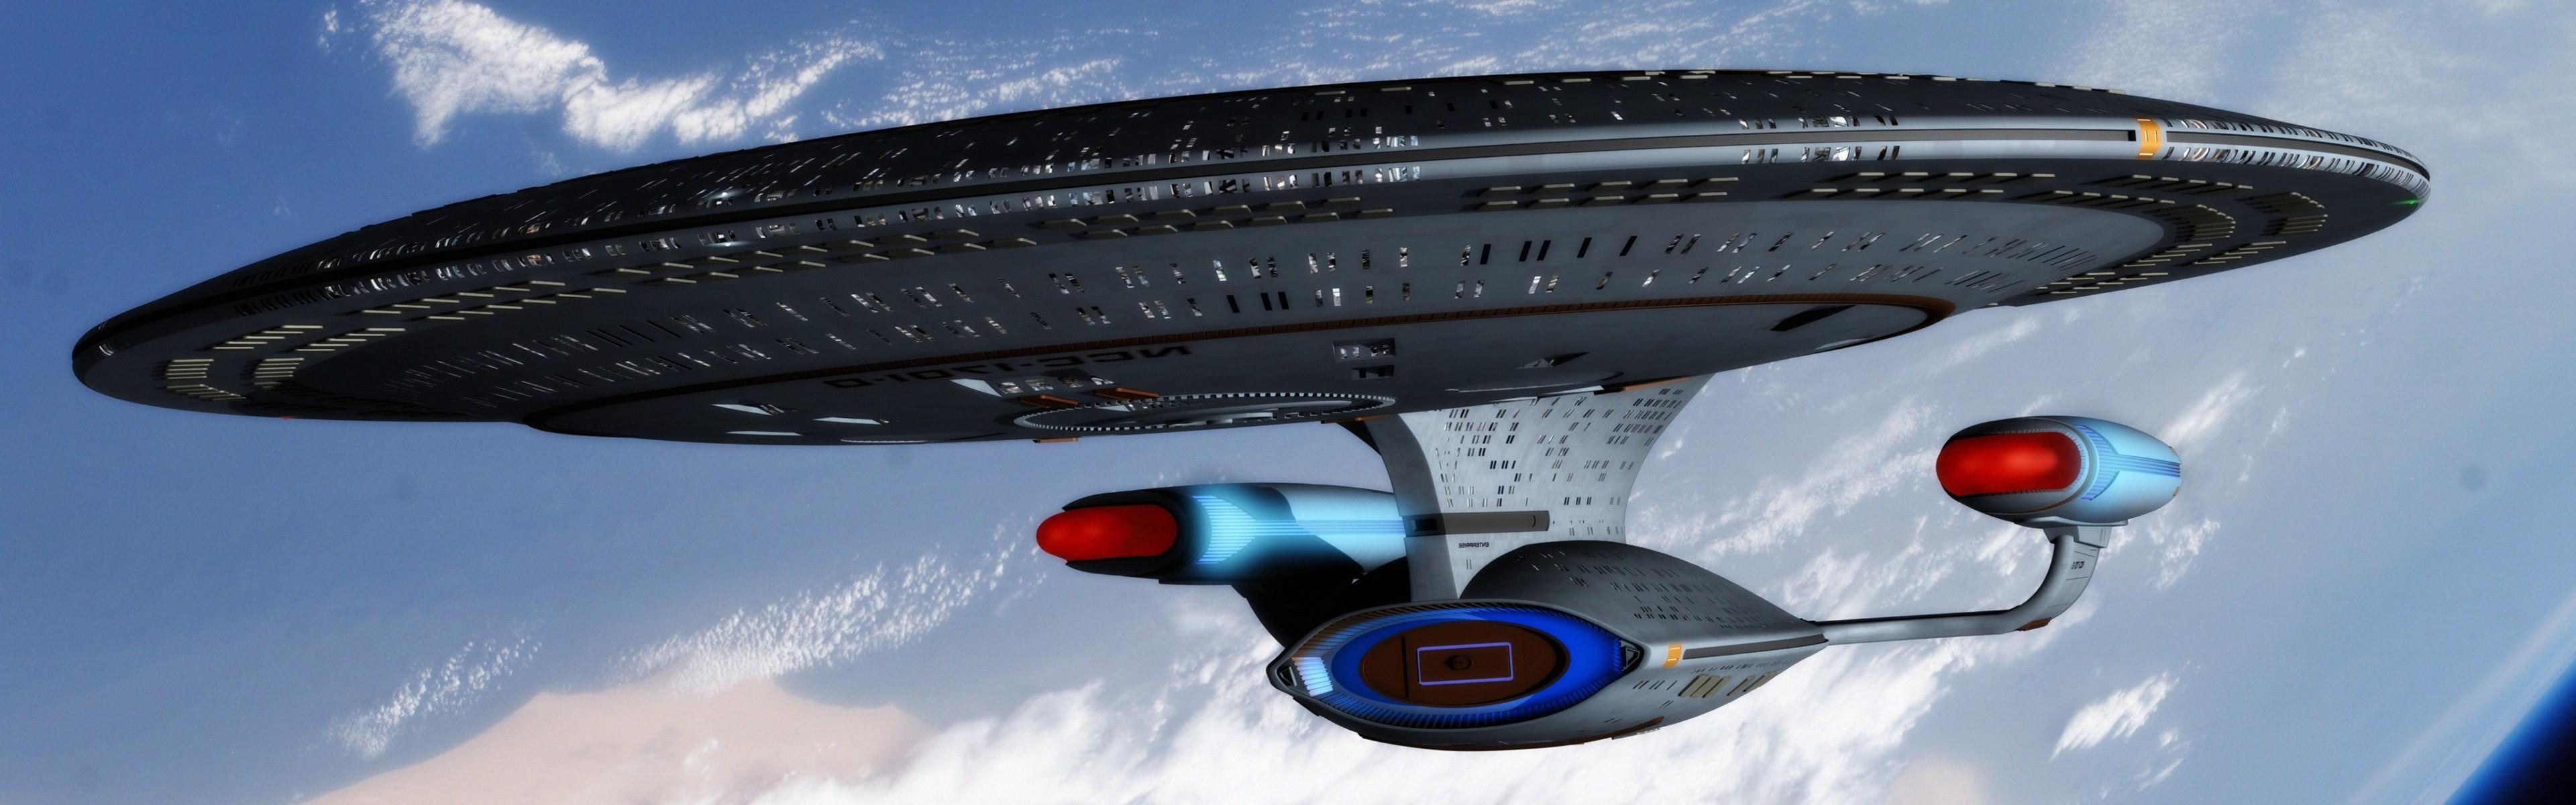 Star Trek, USS Enterprise (spaceship), Space, Multiple Display Wallpapers  HD / Desktop and Mobile Backgrounds